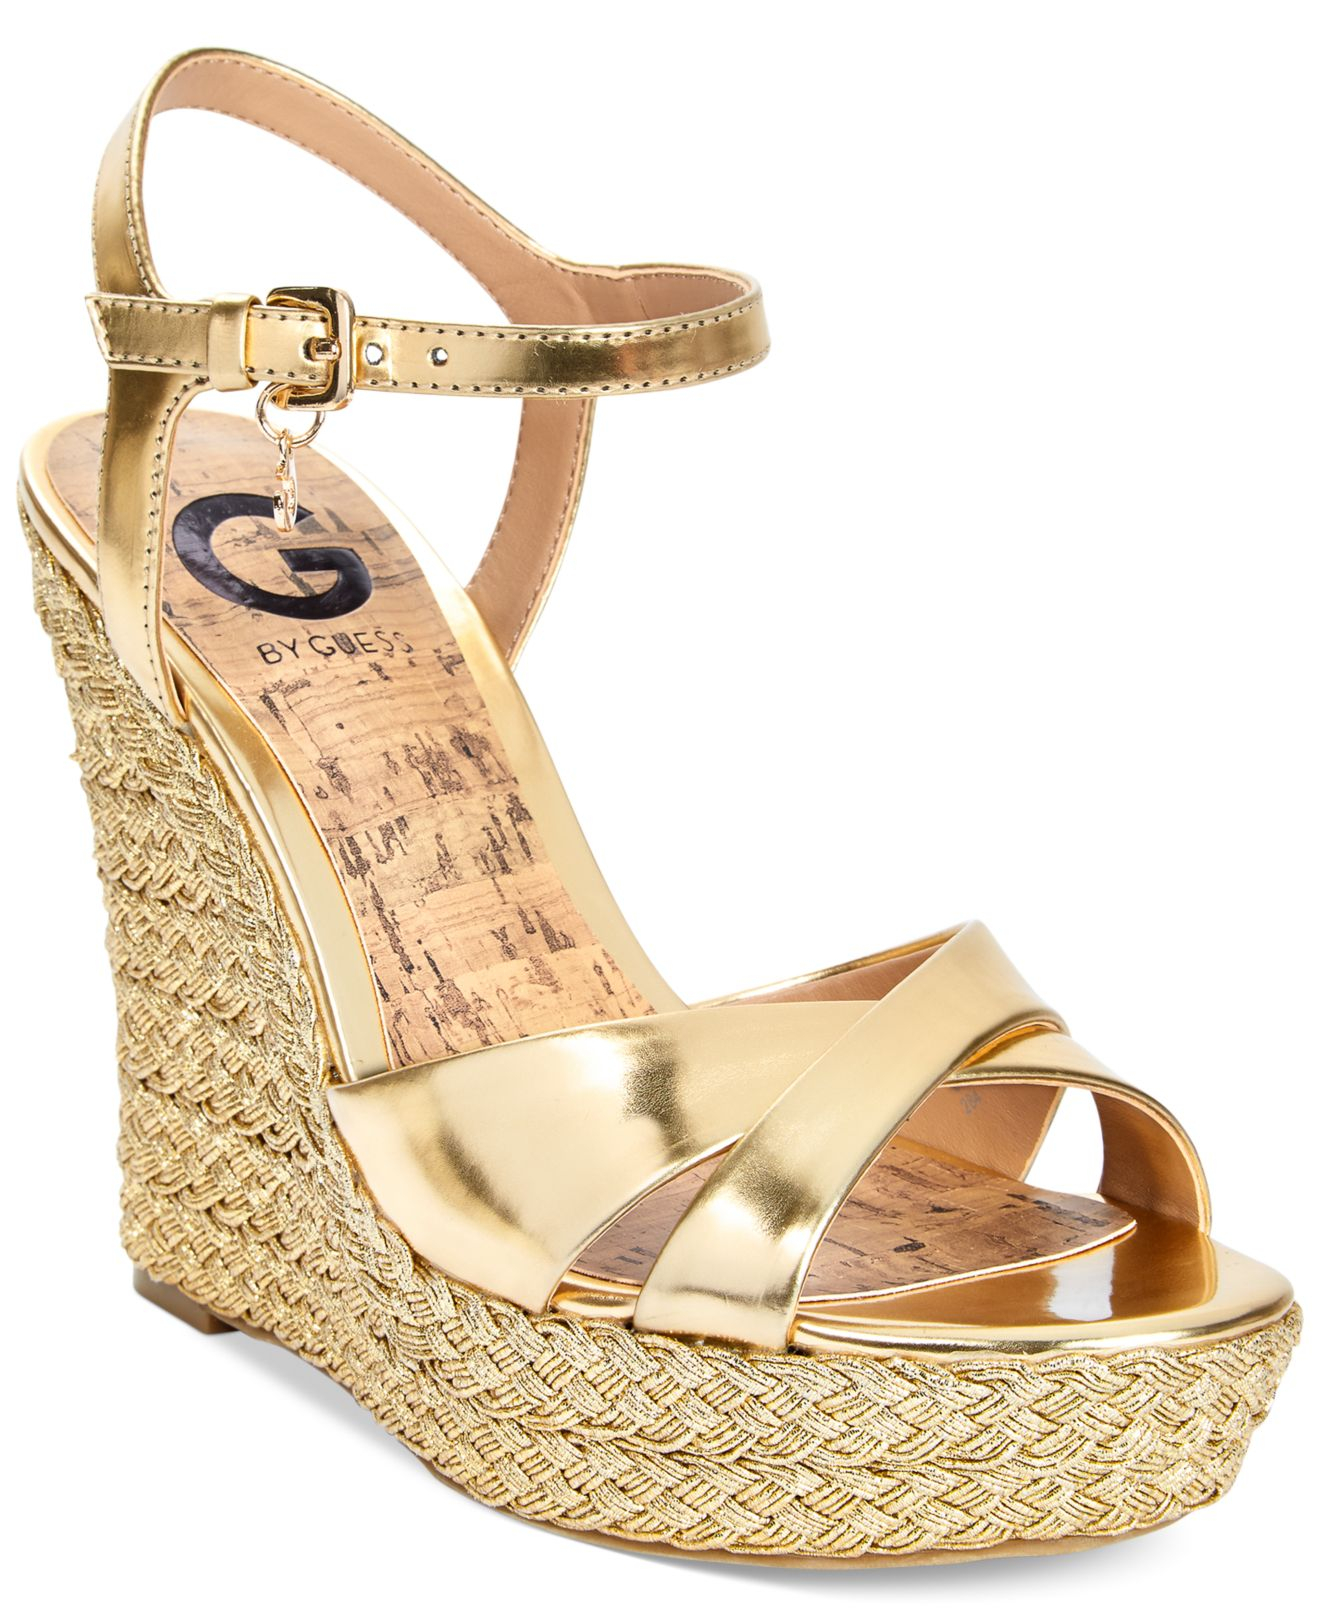 Espadrille G Wedge Metallic In Platform Debbra Sandals Cxeobd By Guess N0w8vmn